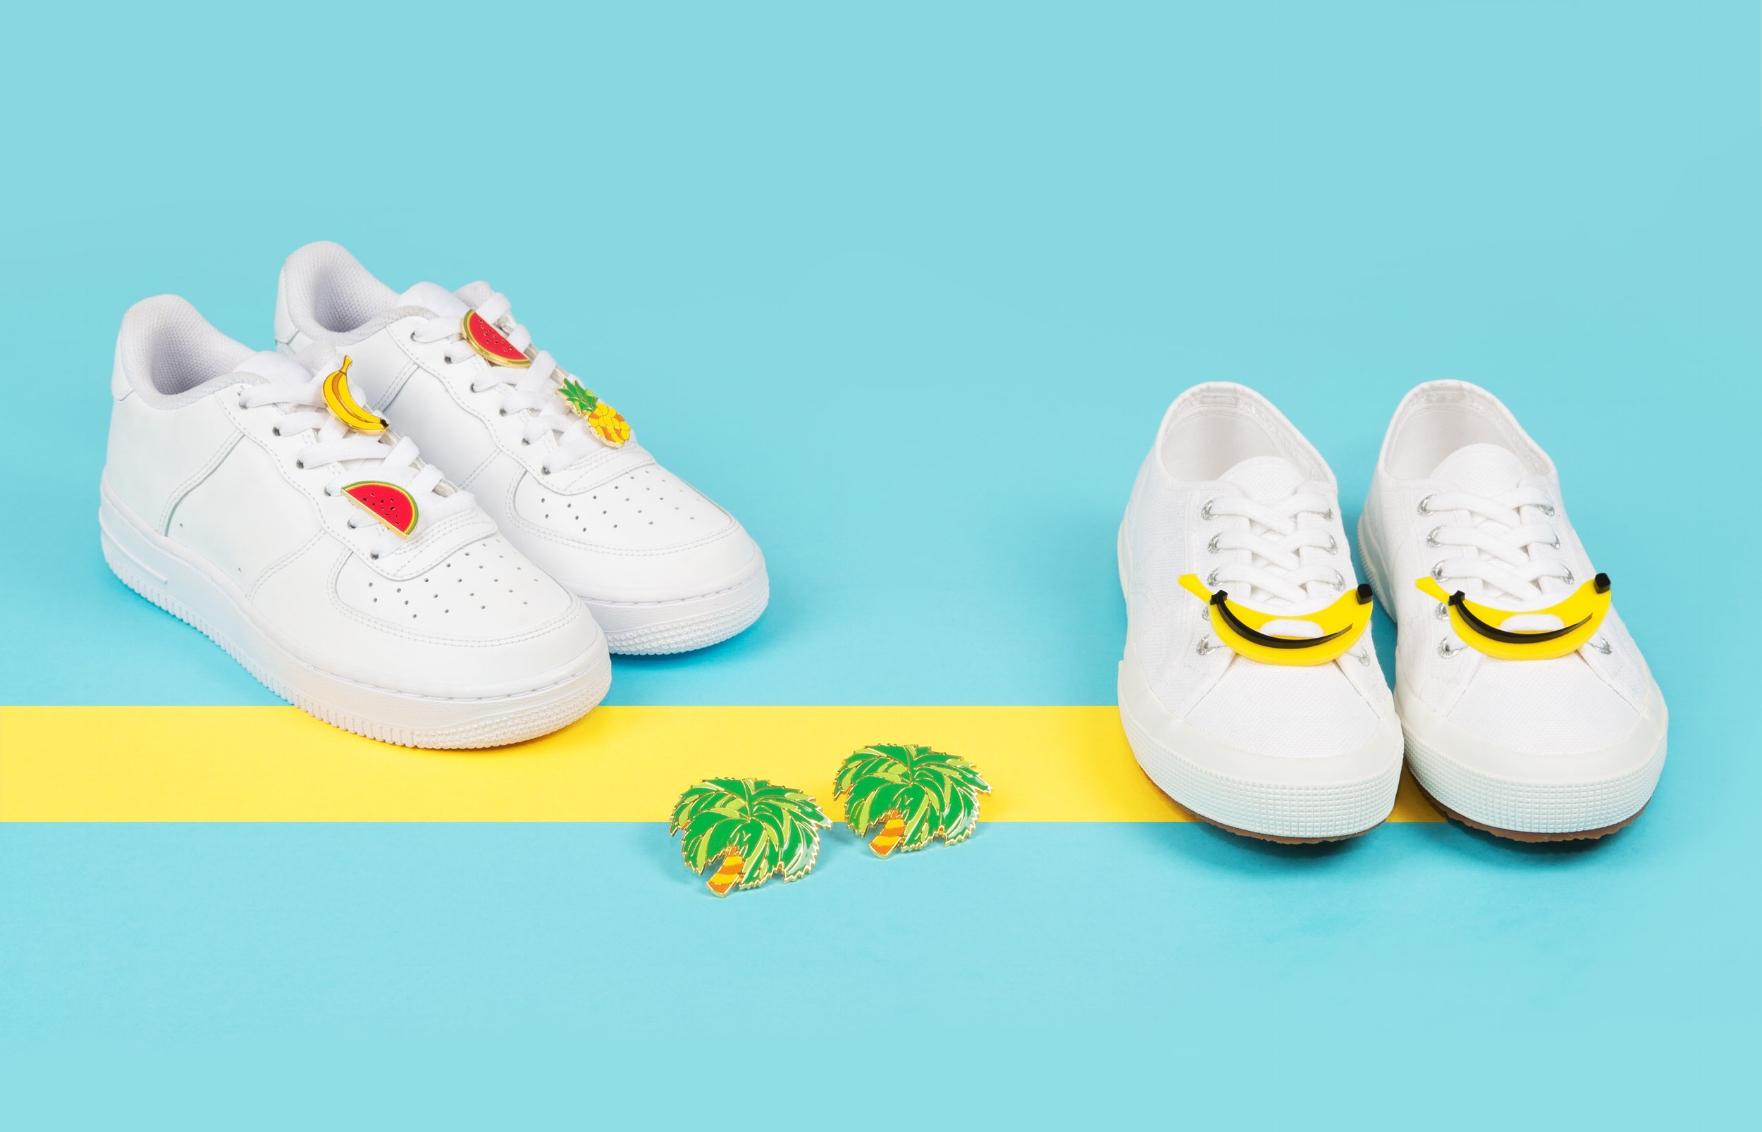 tutti-frutti-shoe-laces-accessories-cleo-b